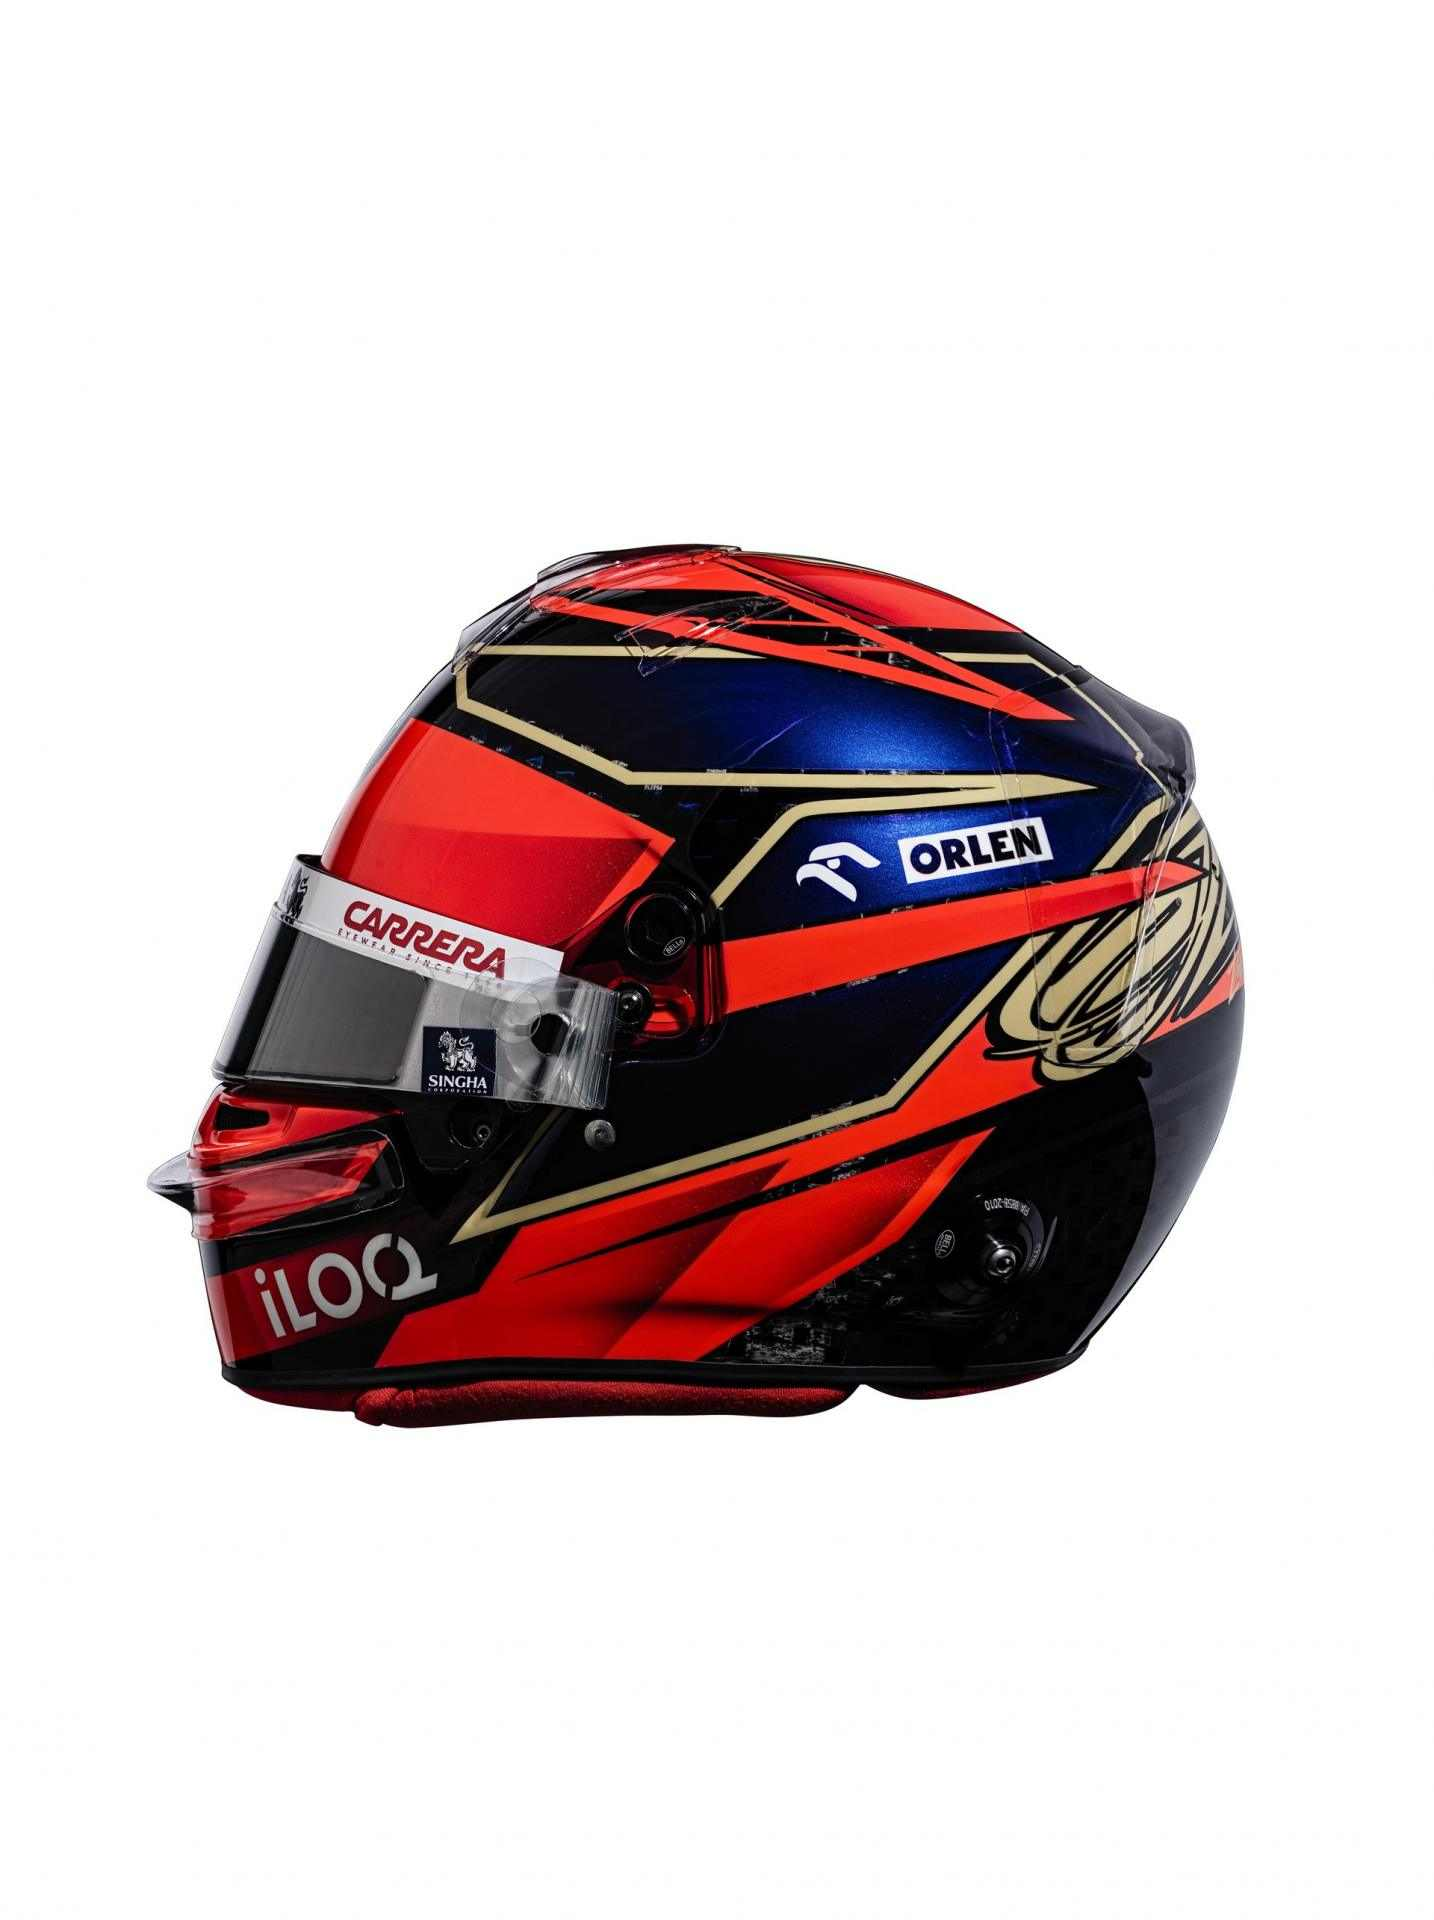 "Kimi-R""ikknen-Helmet-1"